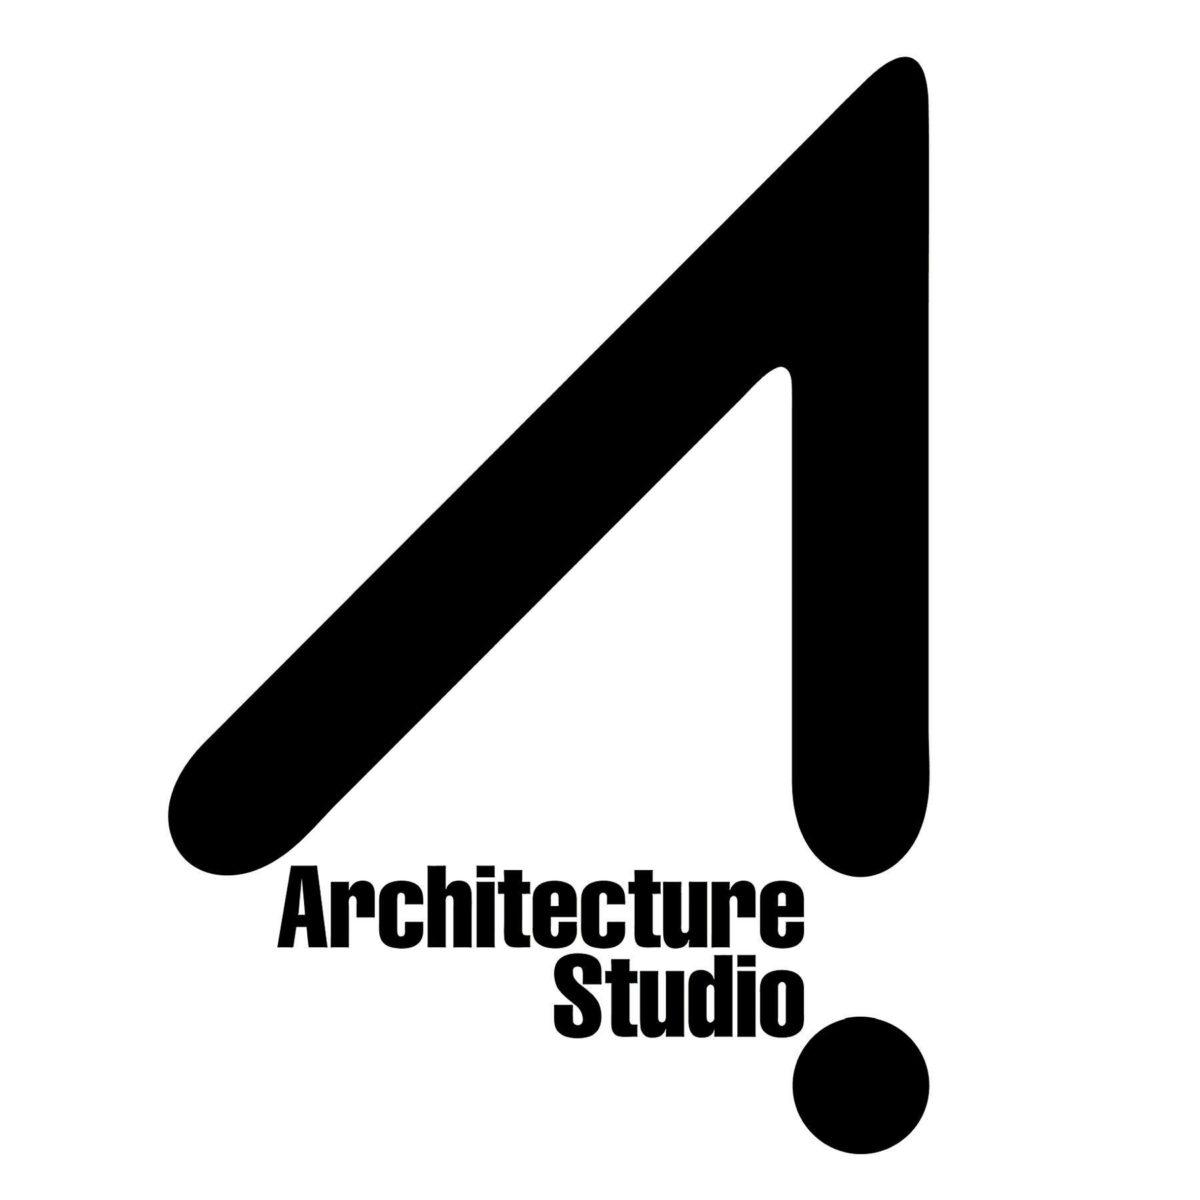 logo, architecture, Some Interisting Facts,interior desing, معماری, معماری داخلی, 4 Architecture studio, استودیو معماری شماره چهار